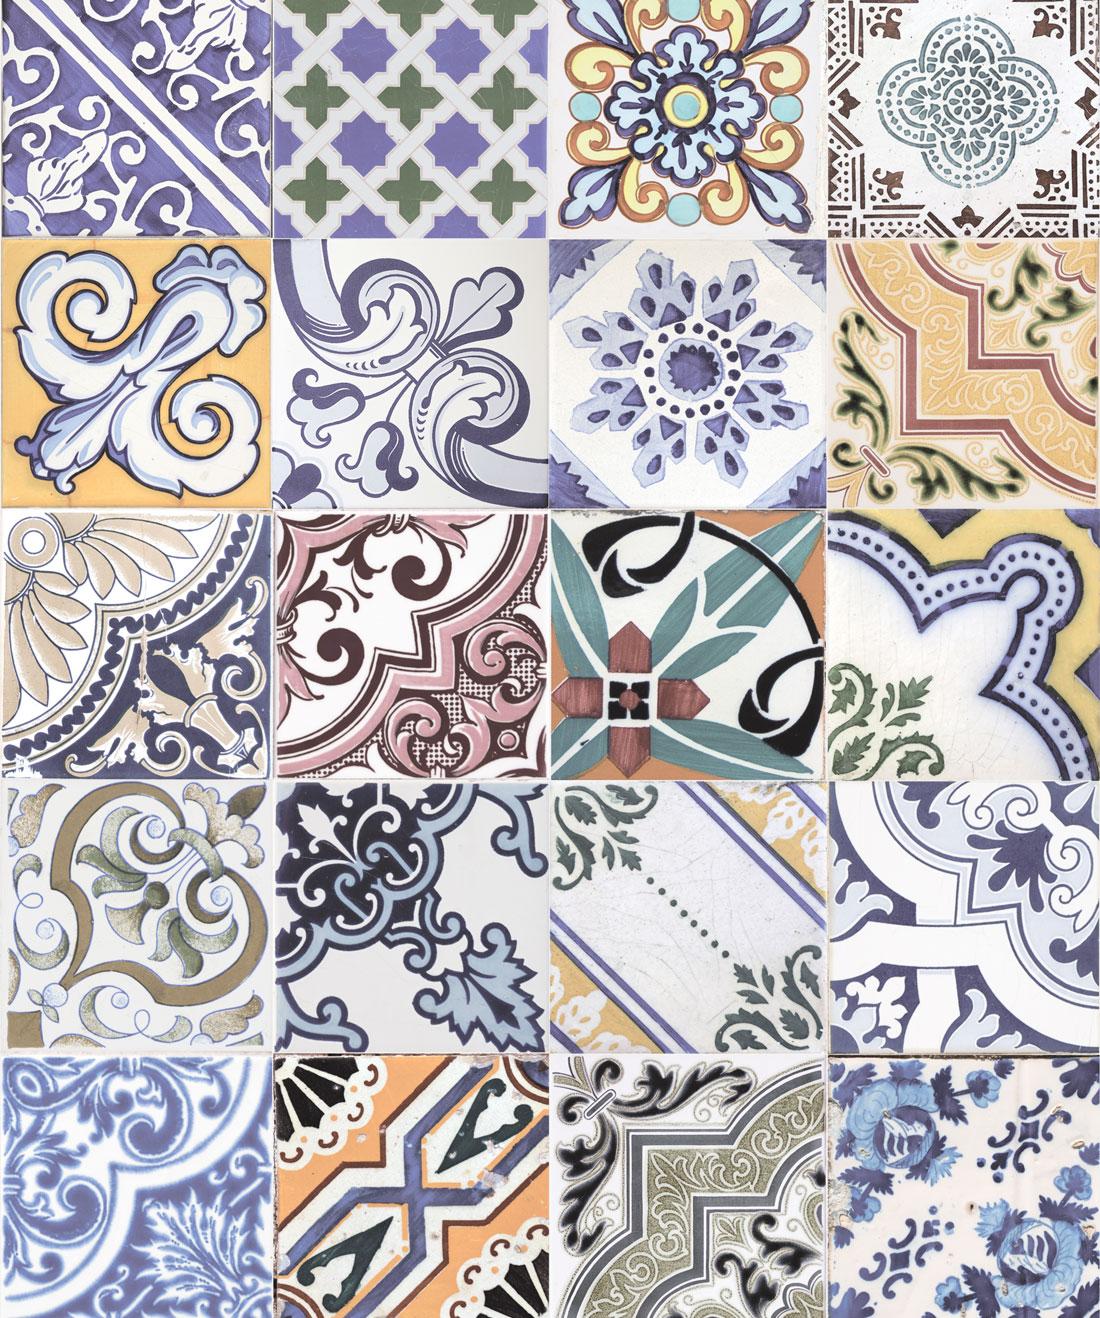 Federation Tiles Wallpaper